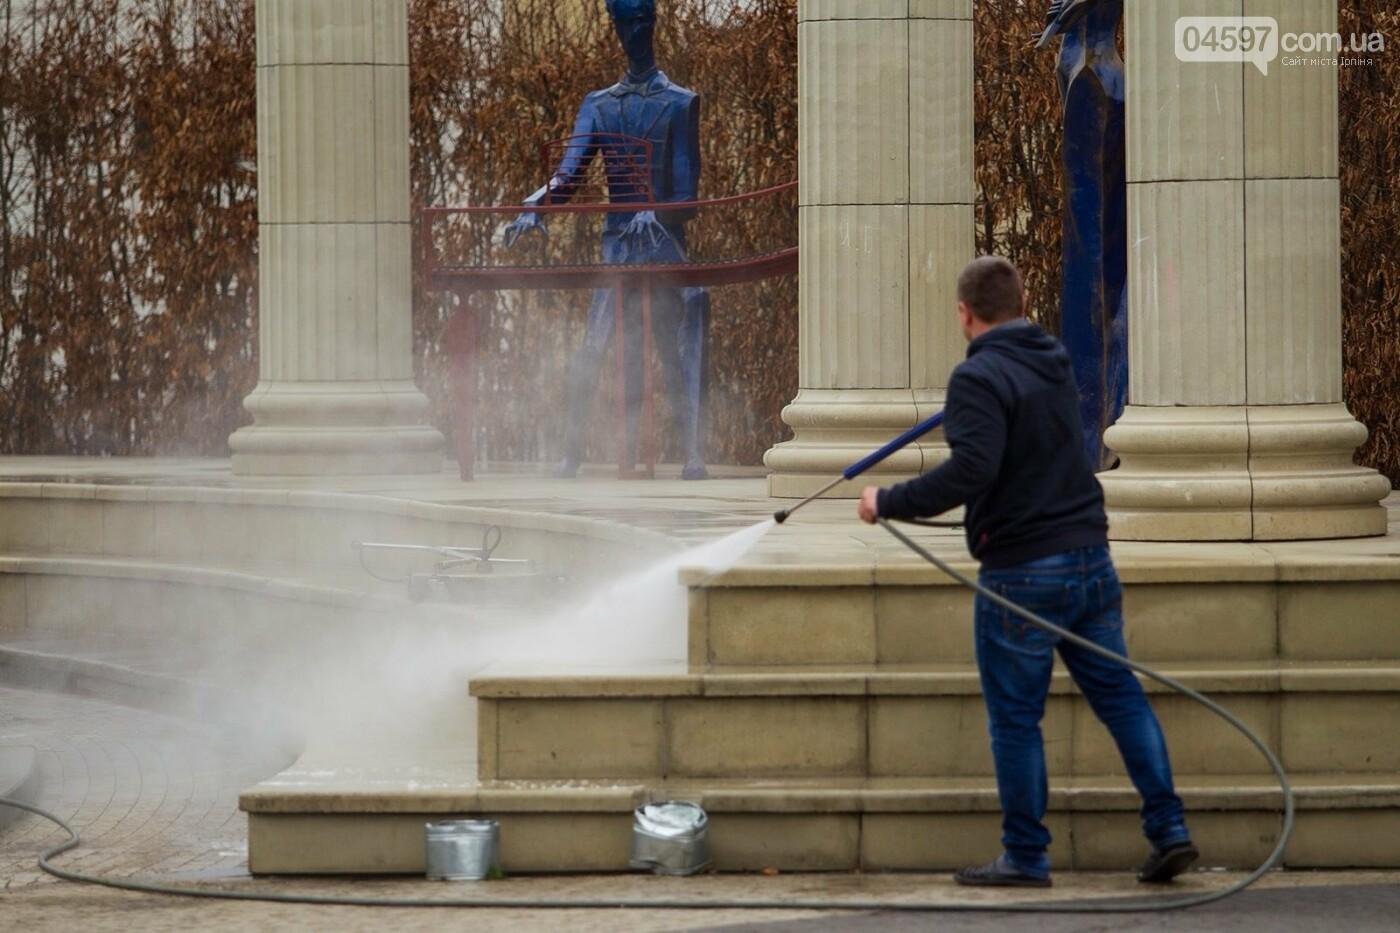 Комунальники миють Центральну площу, фото-1